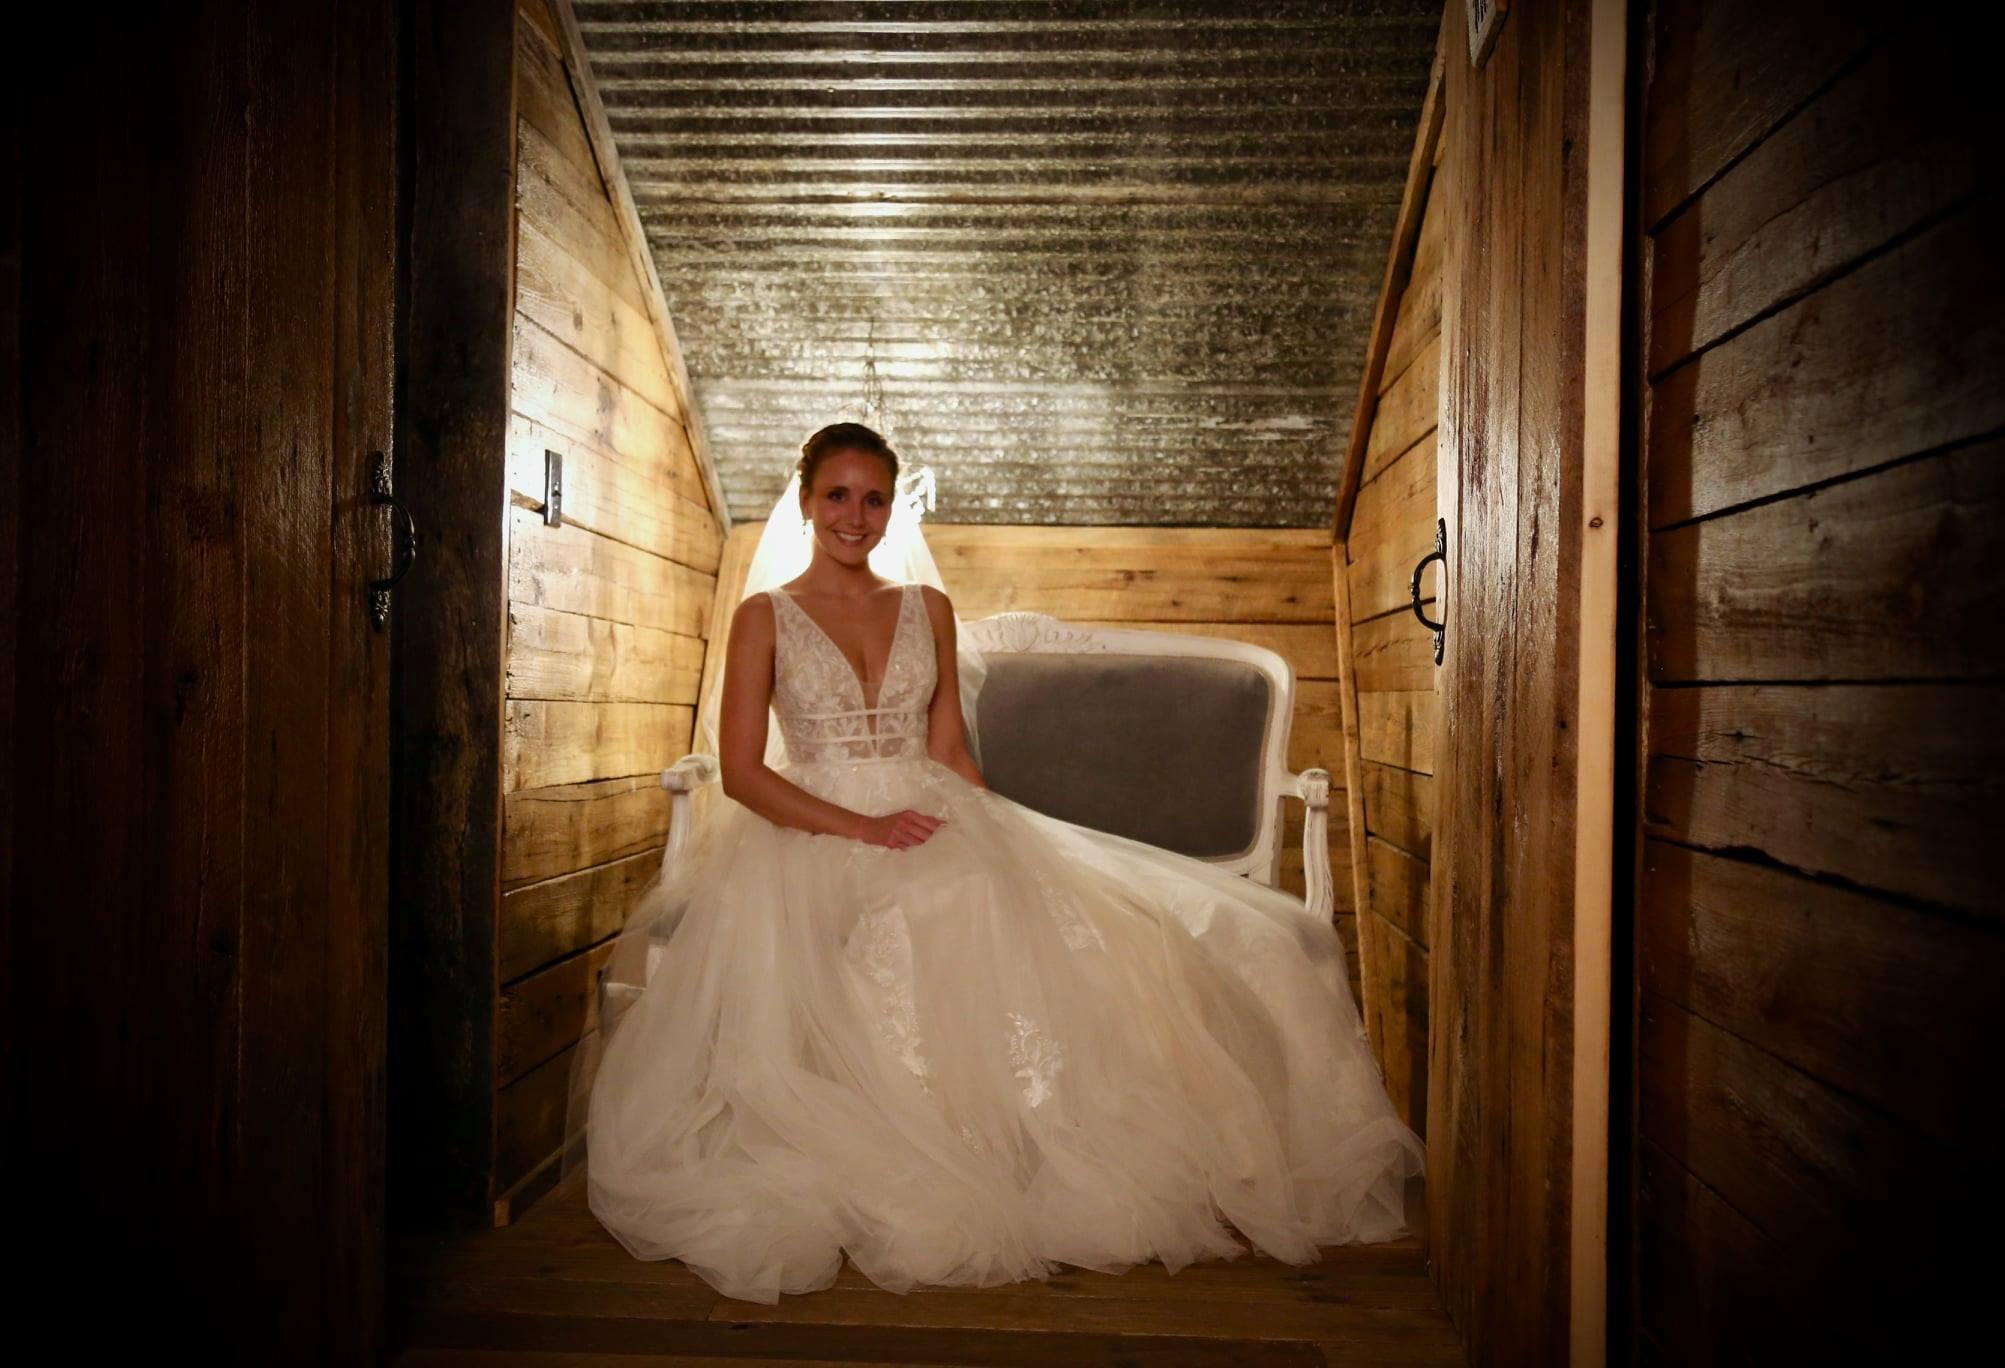 elegant and class bride with wedding garter in barn wedding